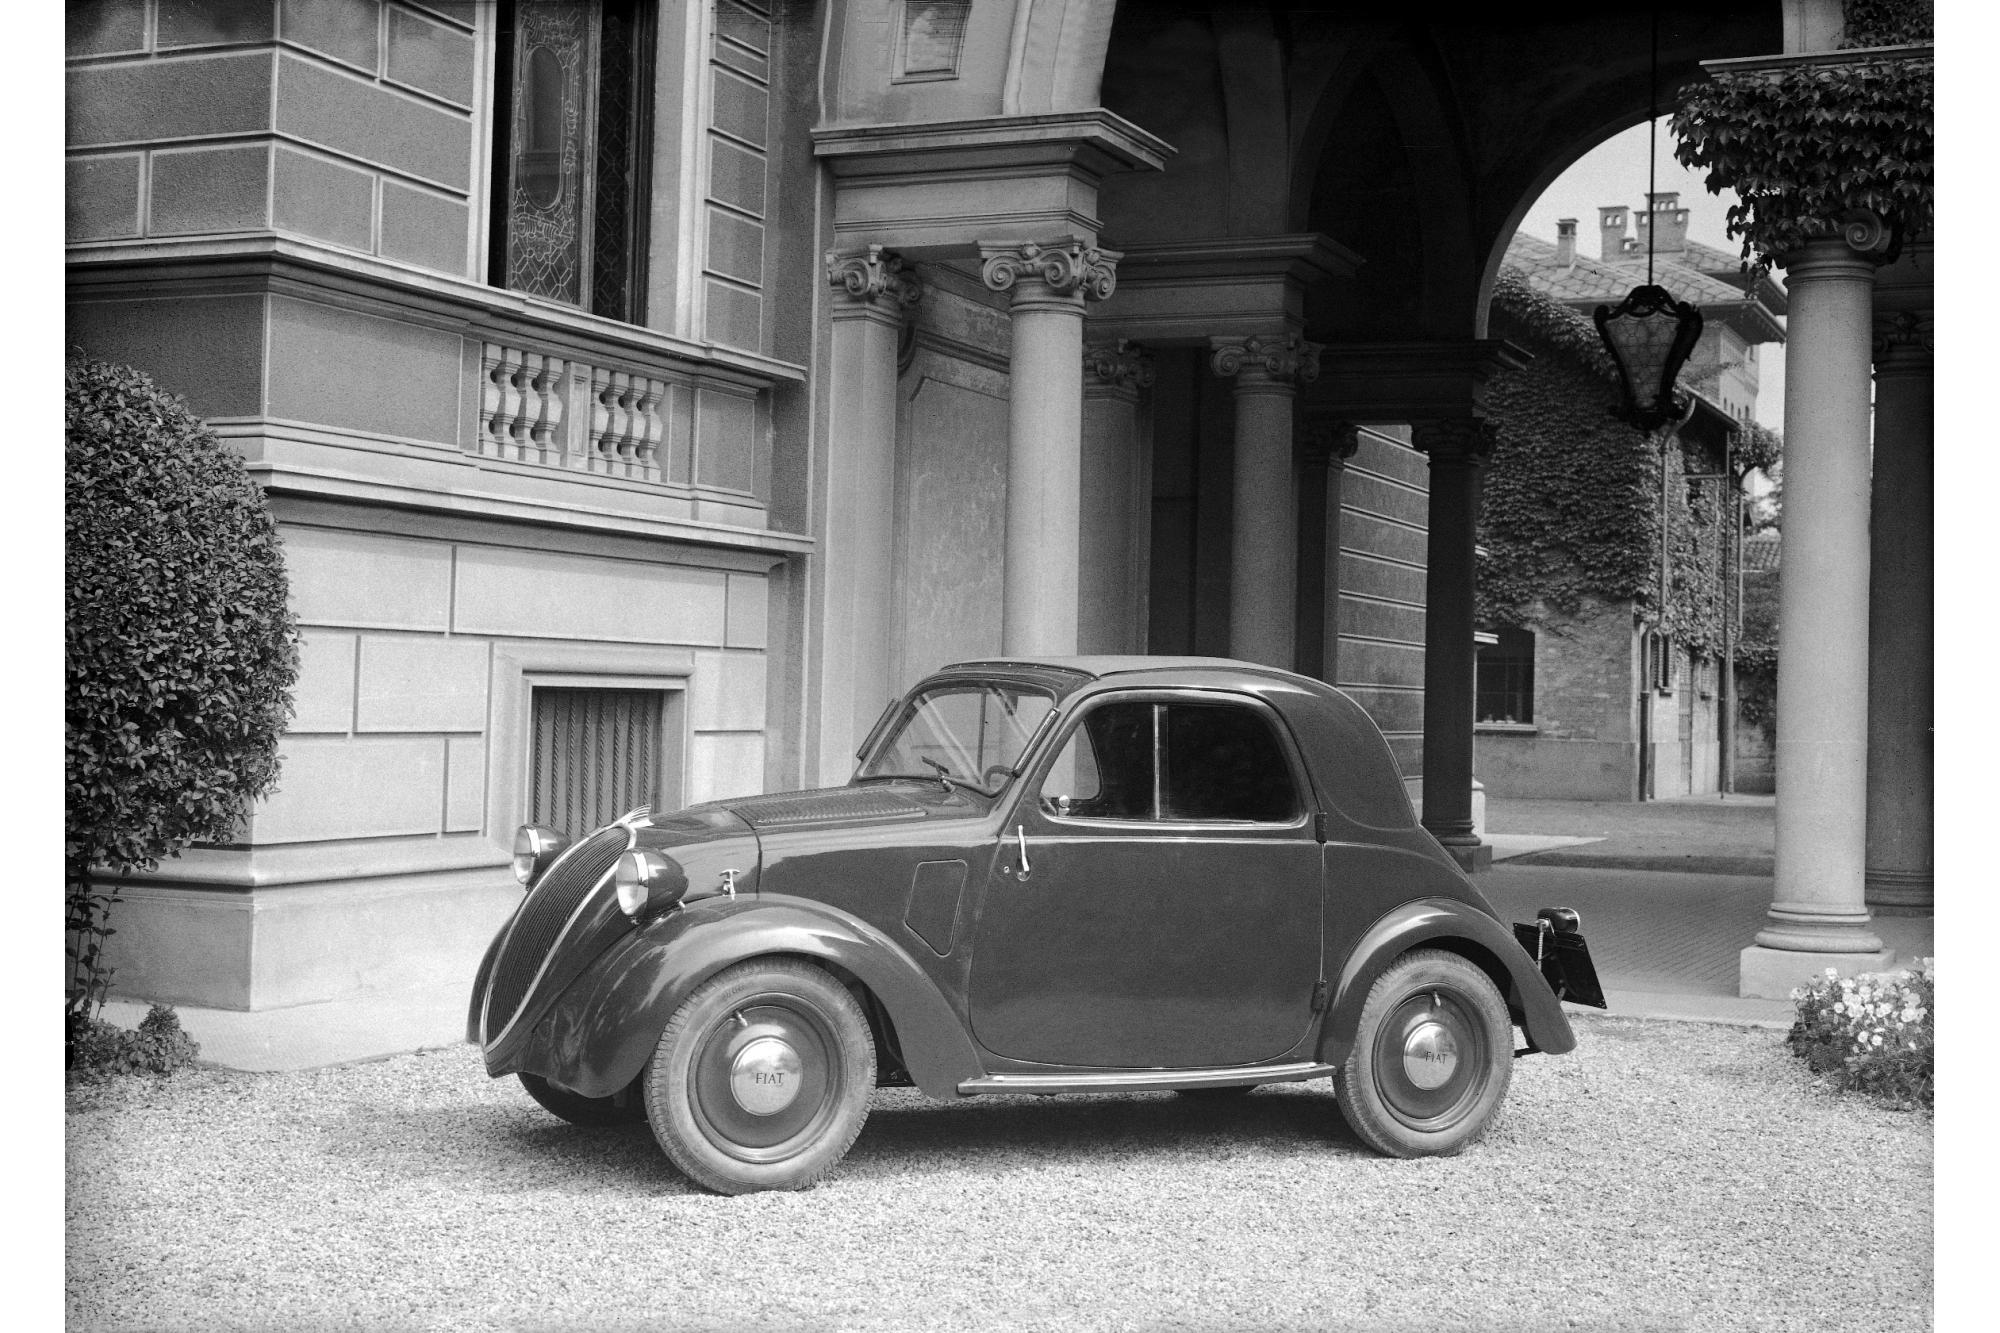 Dante Giacosa: Ο «Αρχιτέκτονας» του σύγχρονου αυτοκινήτου.